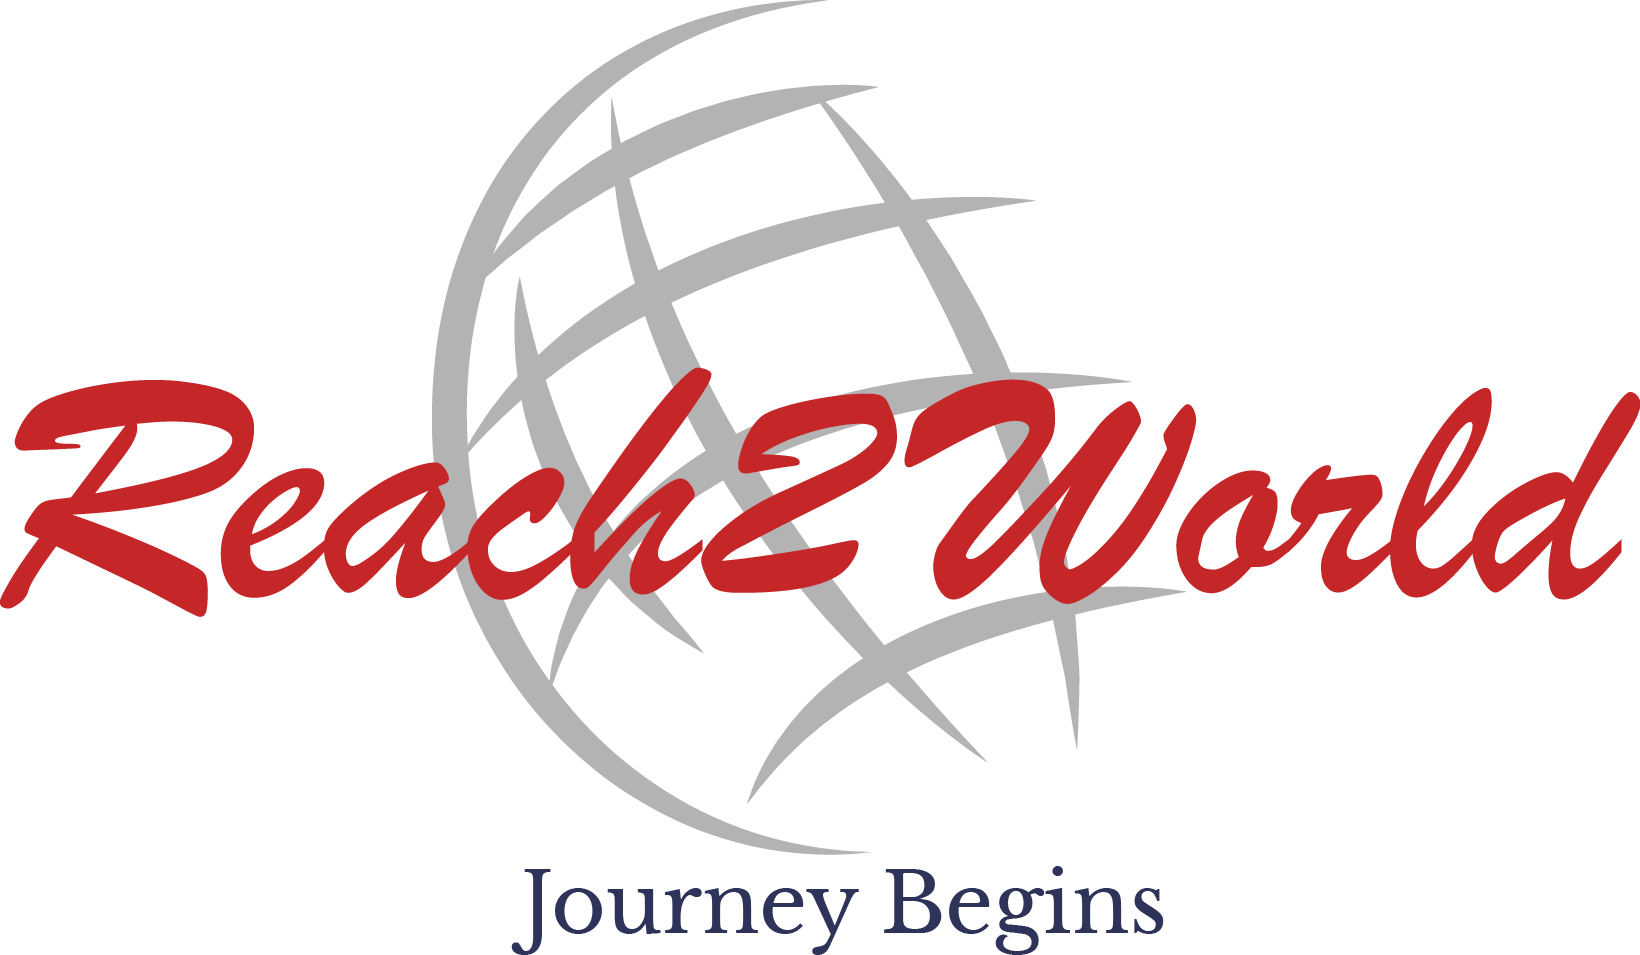 Reach To World Management Consultancy LLC